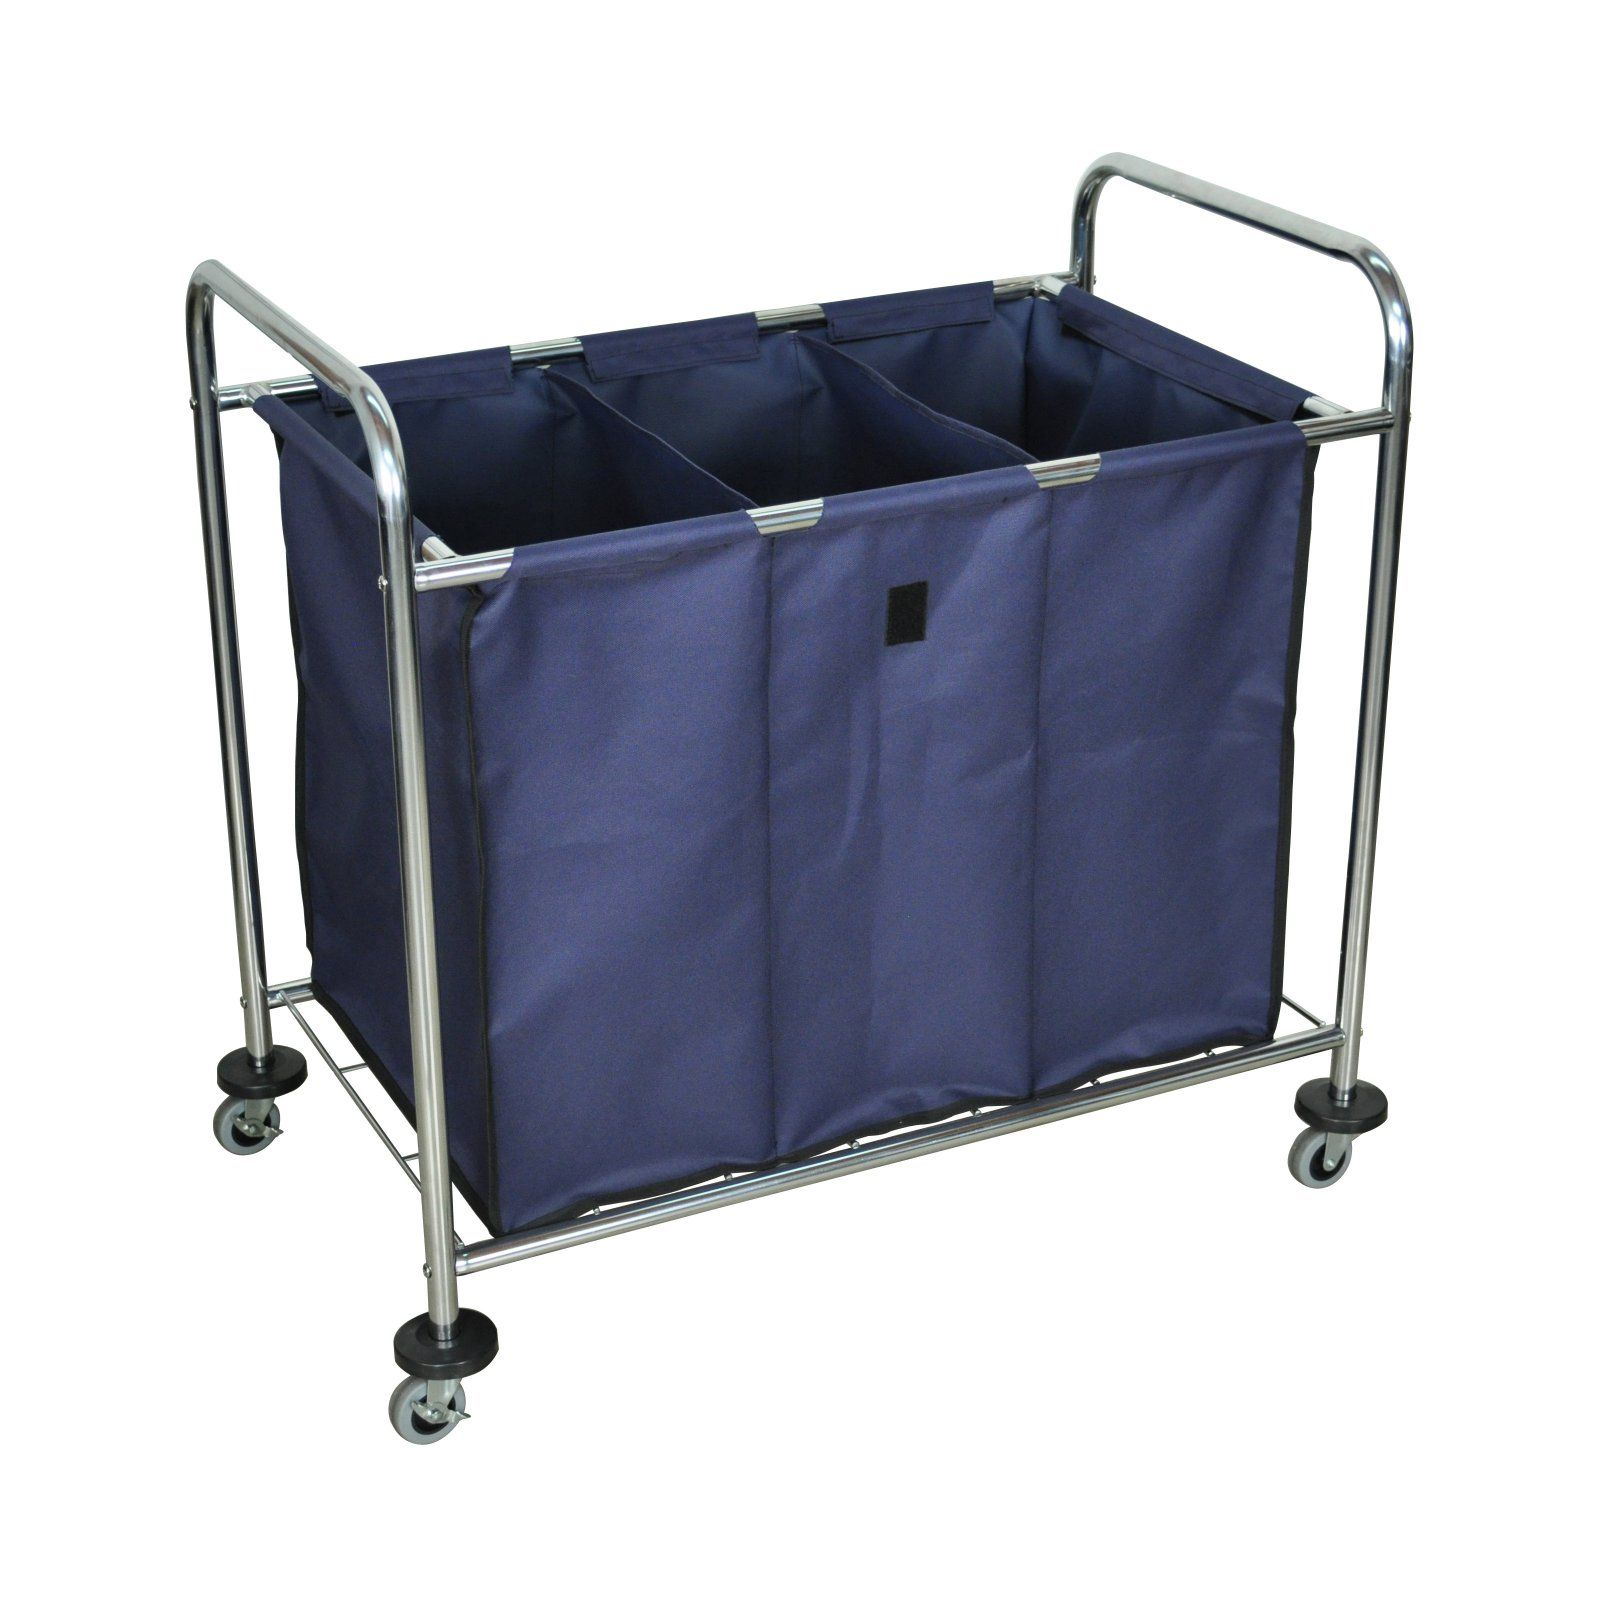 Luxor Industrial Laundry Cart Laundry Cart Laundry Sorter Laundry